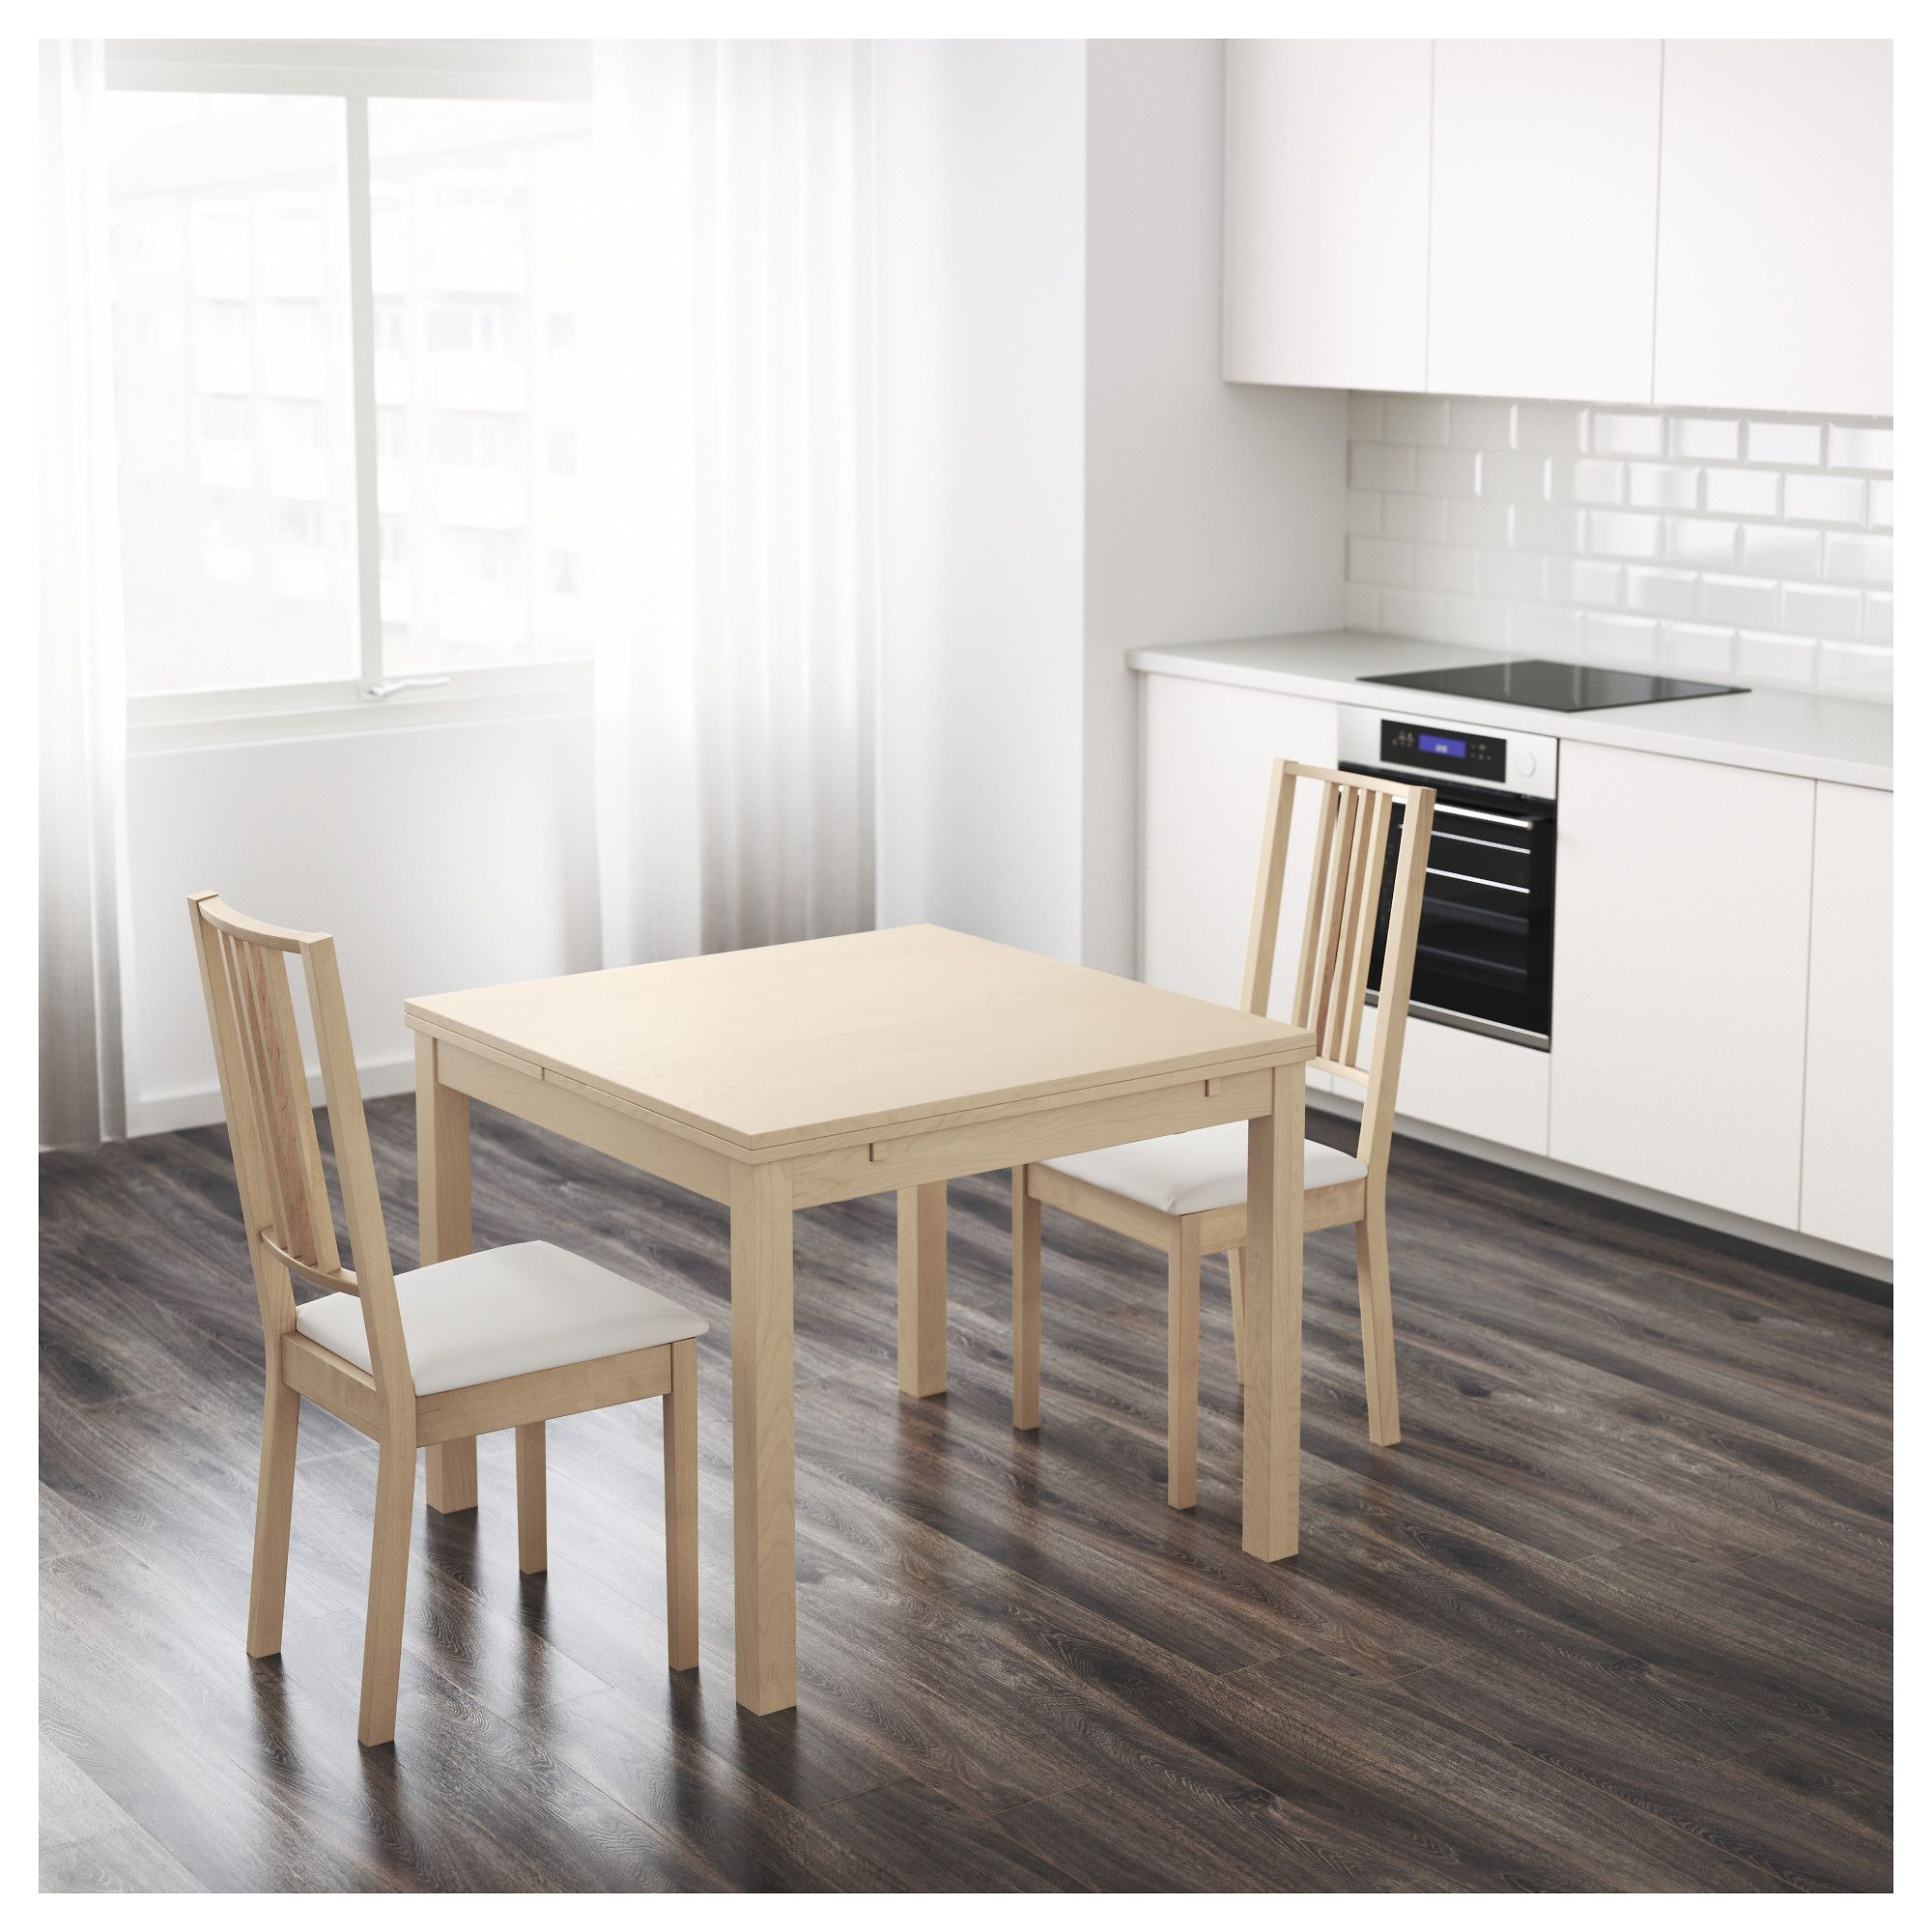 0d68c427d35d13016538f943b62dc0e2 Frais De Alinea Table Cuisine Conception